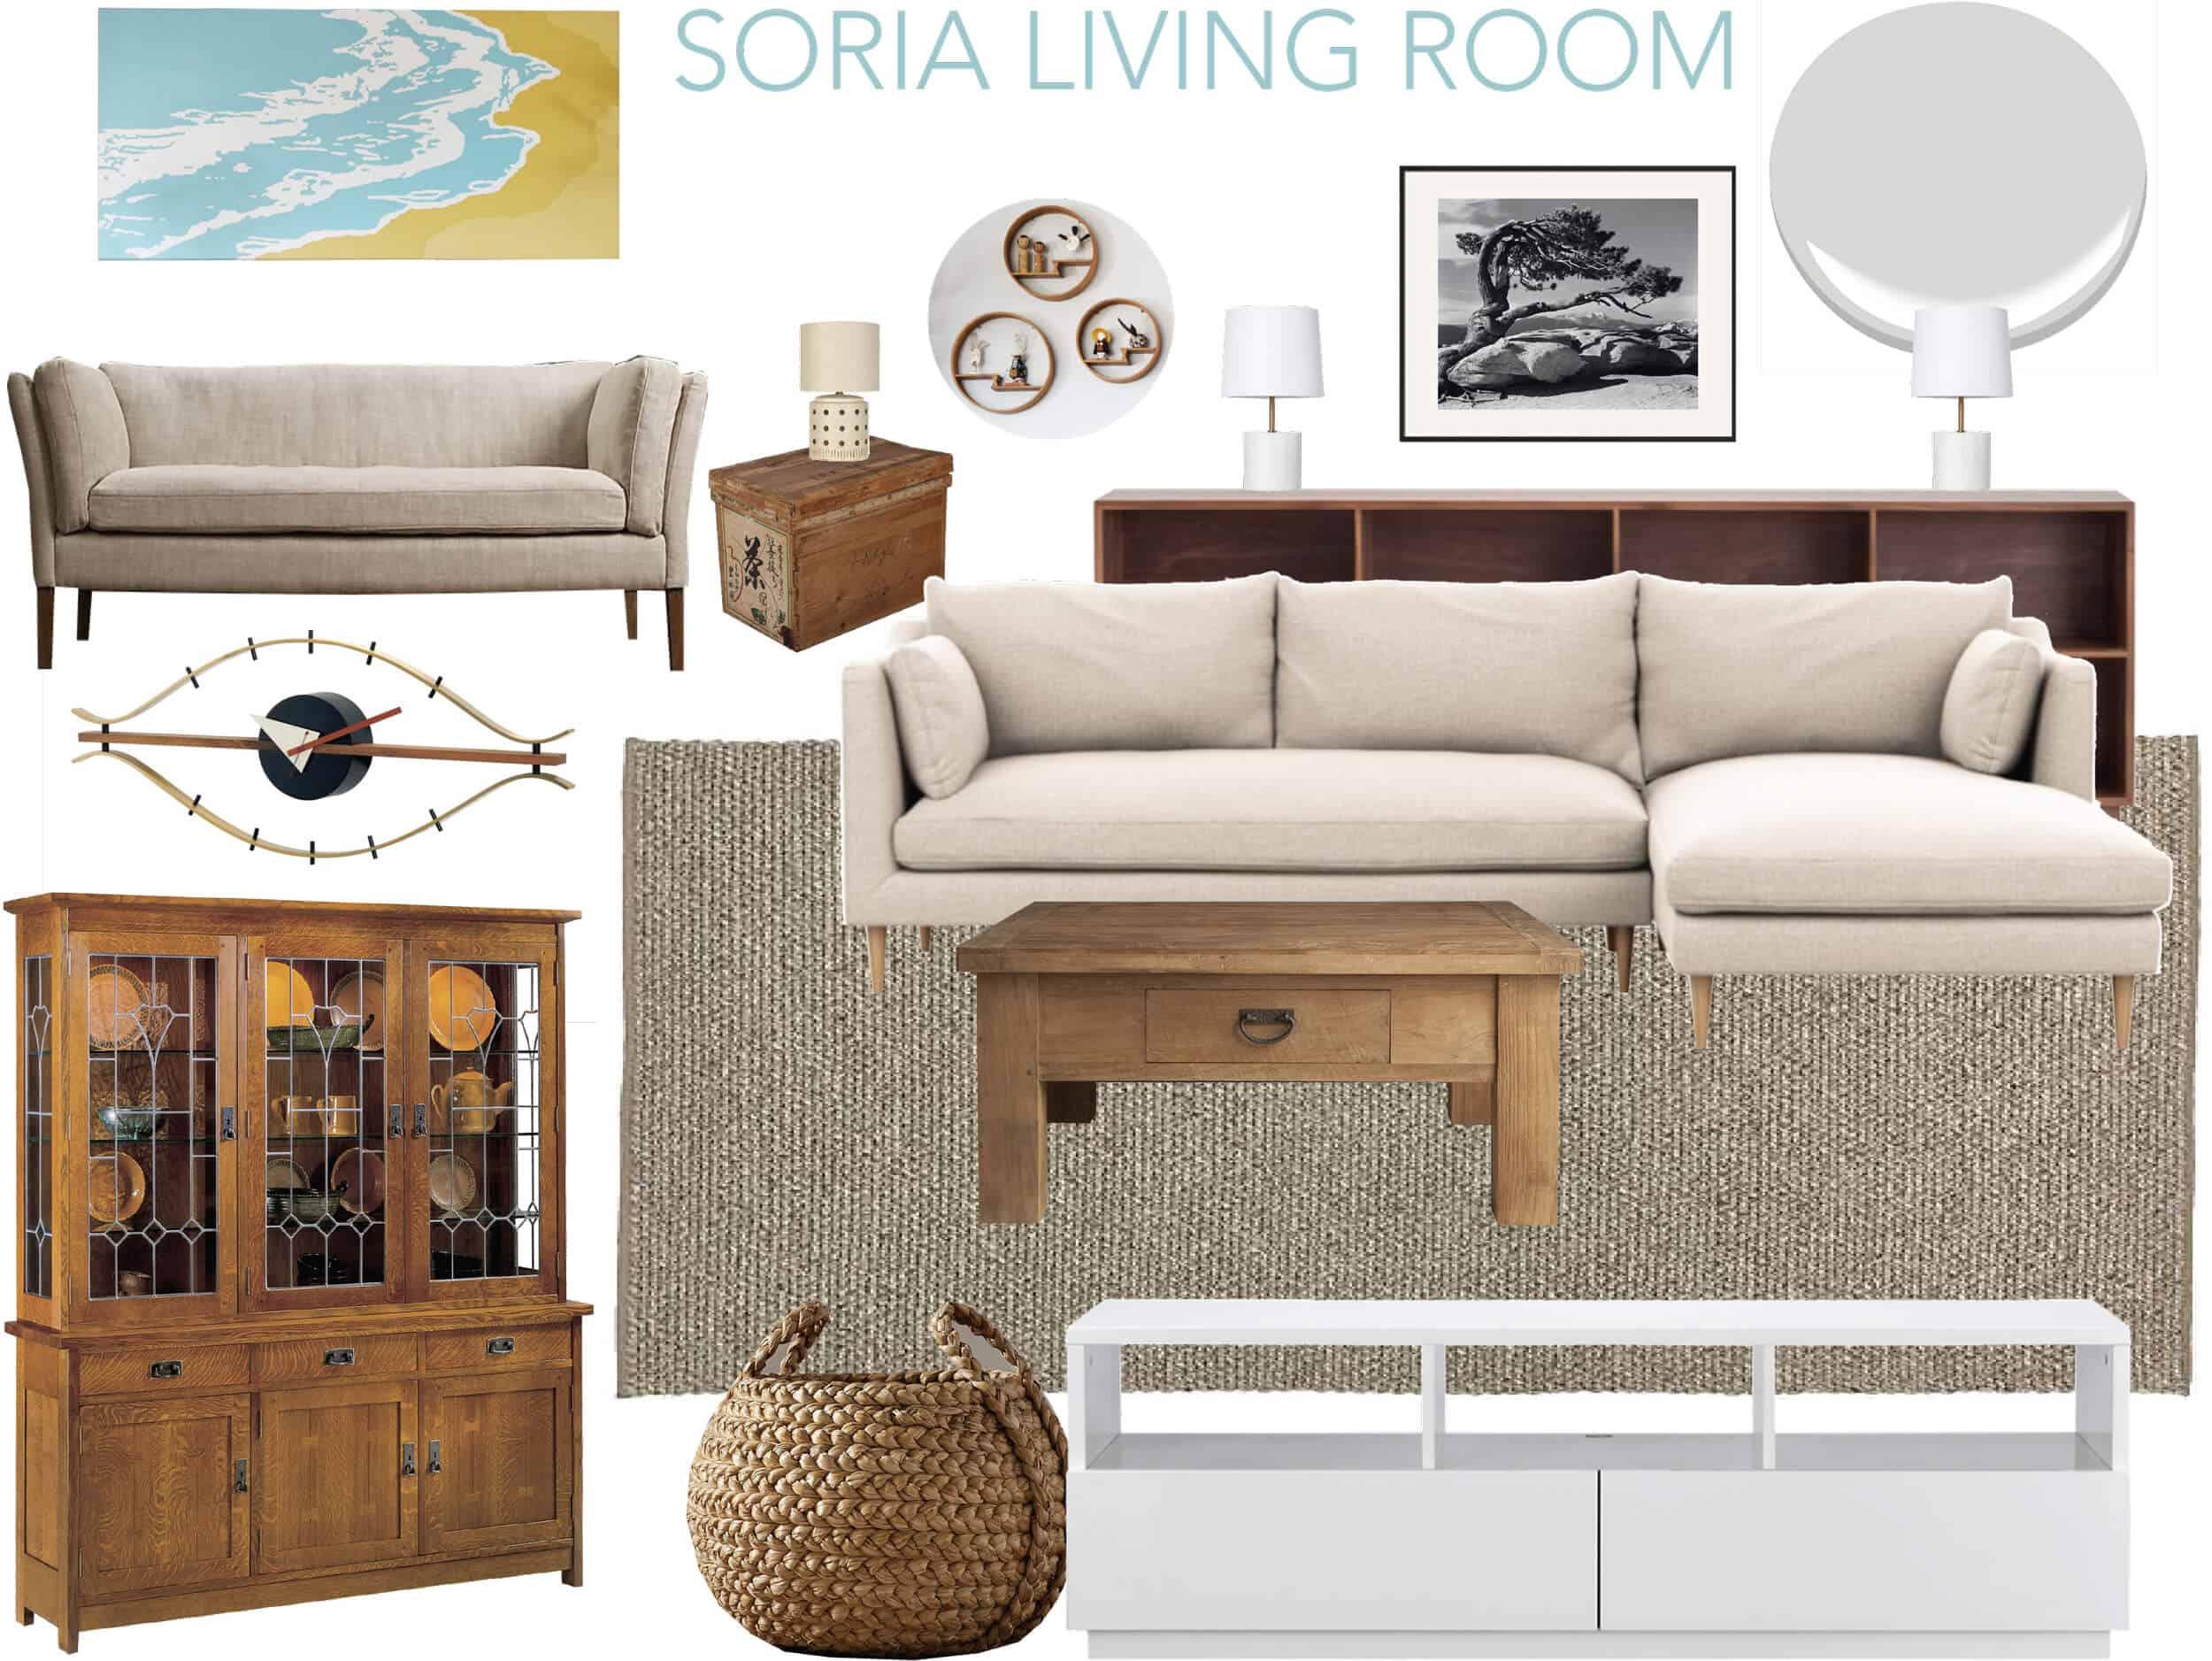 Soria Living Room 11